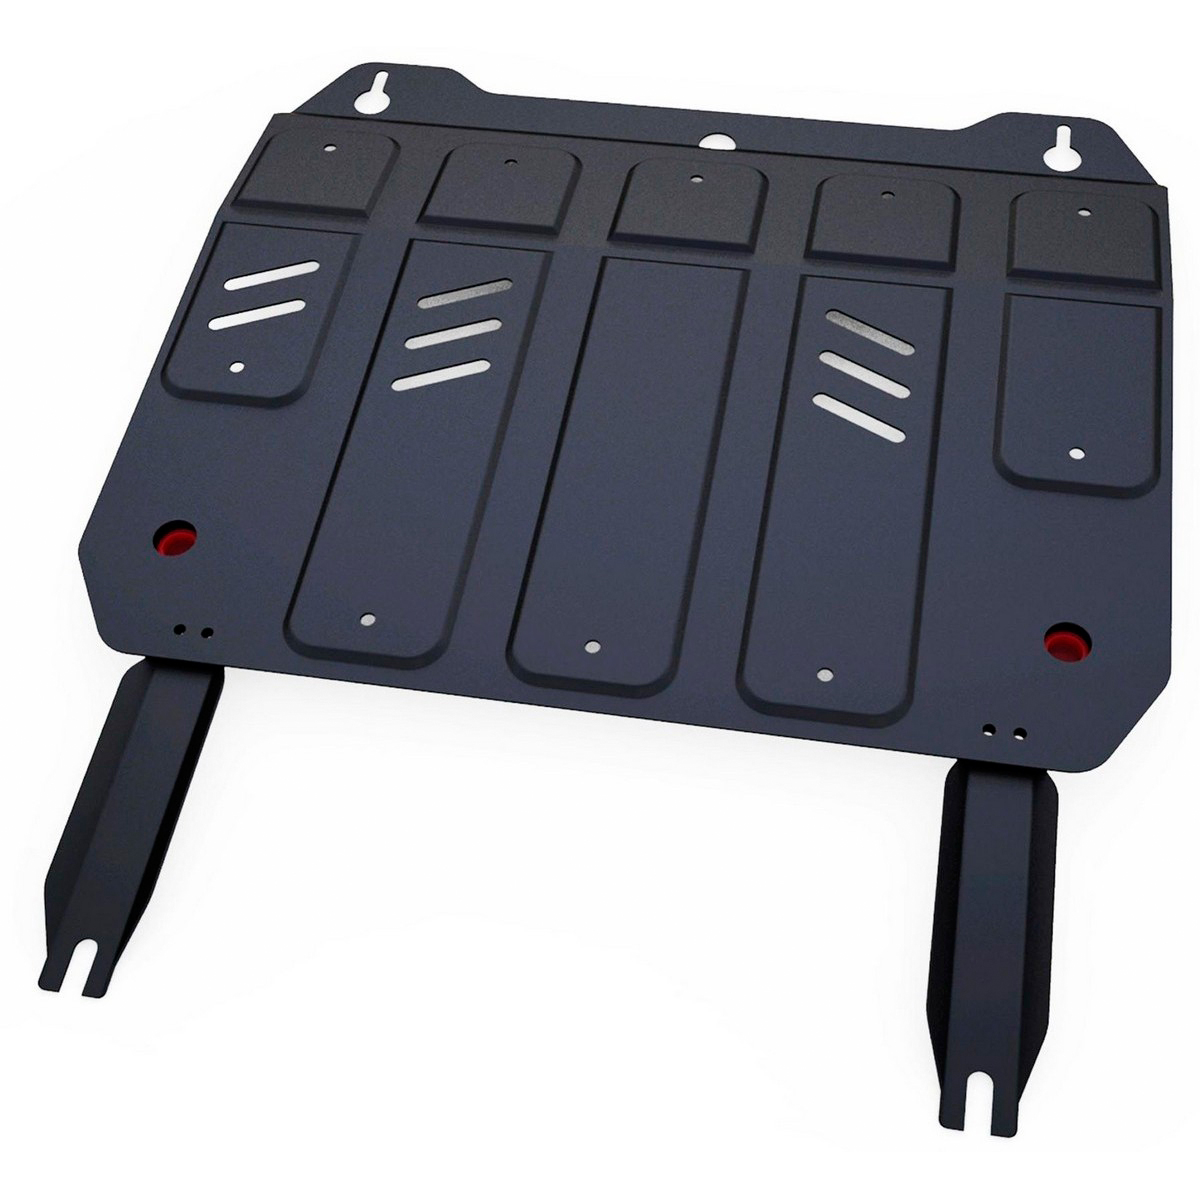 Купить Защита картера и КПП Автоброня Geely MK 2008-/Geely GC6 2014-/Geely MK Cross 2011-, сталь 2 мм